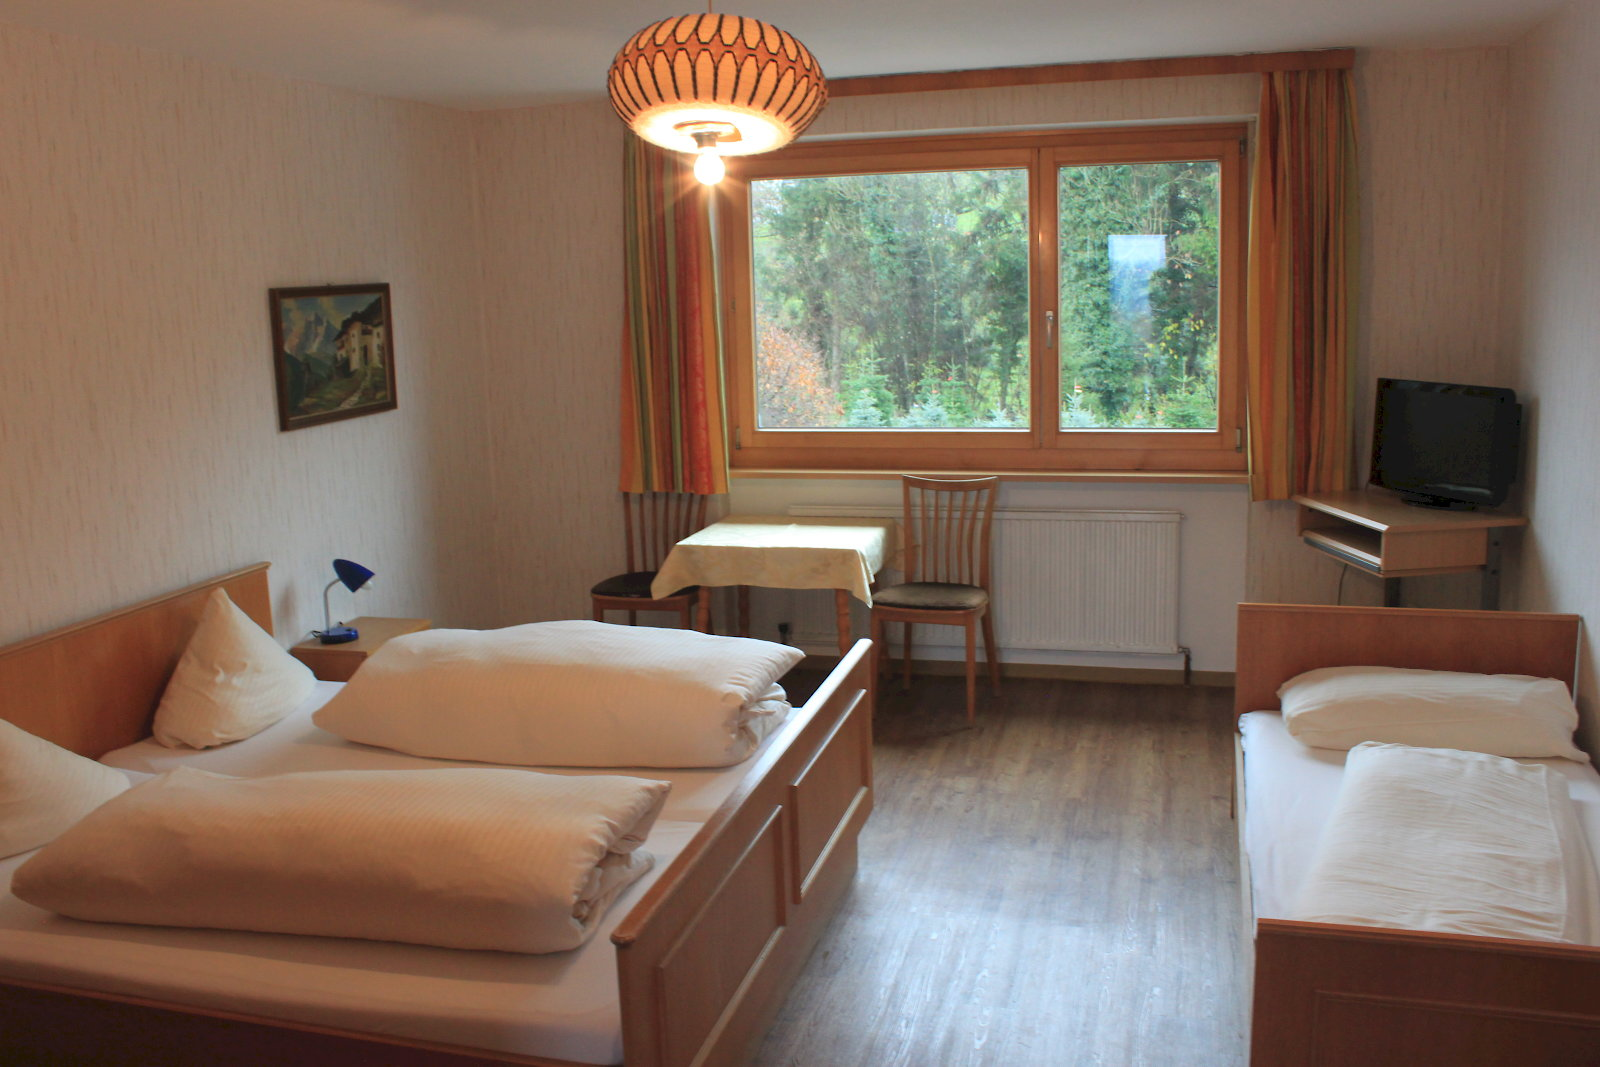 Appartement de vacances B&B - Restaurant TSINGDAO (Hörbranz). Doppelzimmer (2437460), Hörbranz, Bregenz, Vorarlberg, Autriche, image 5